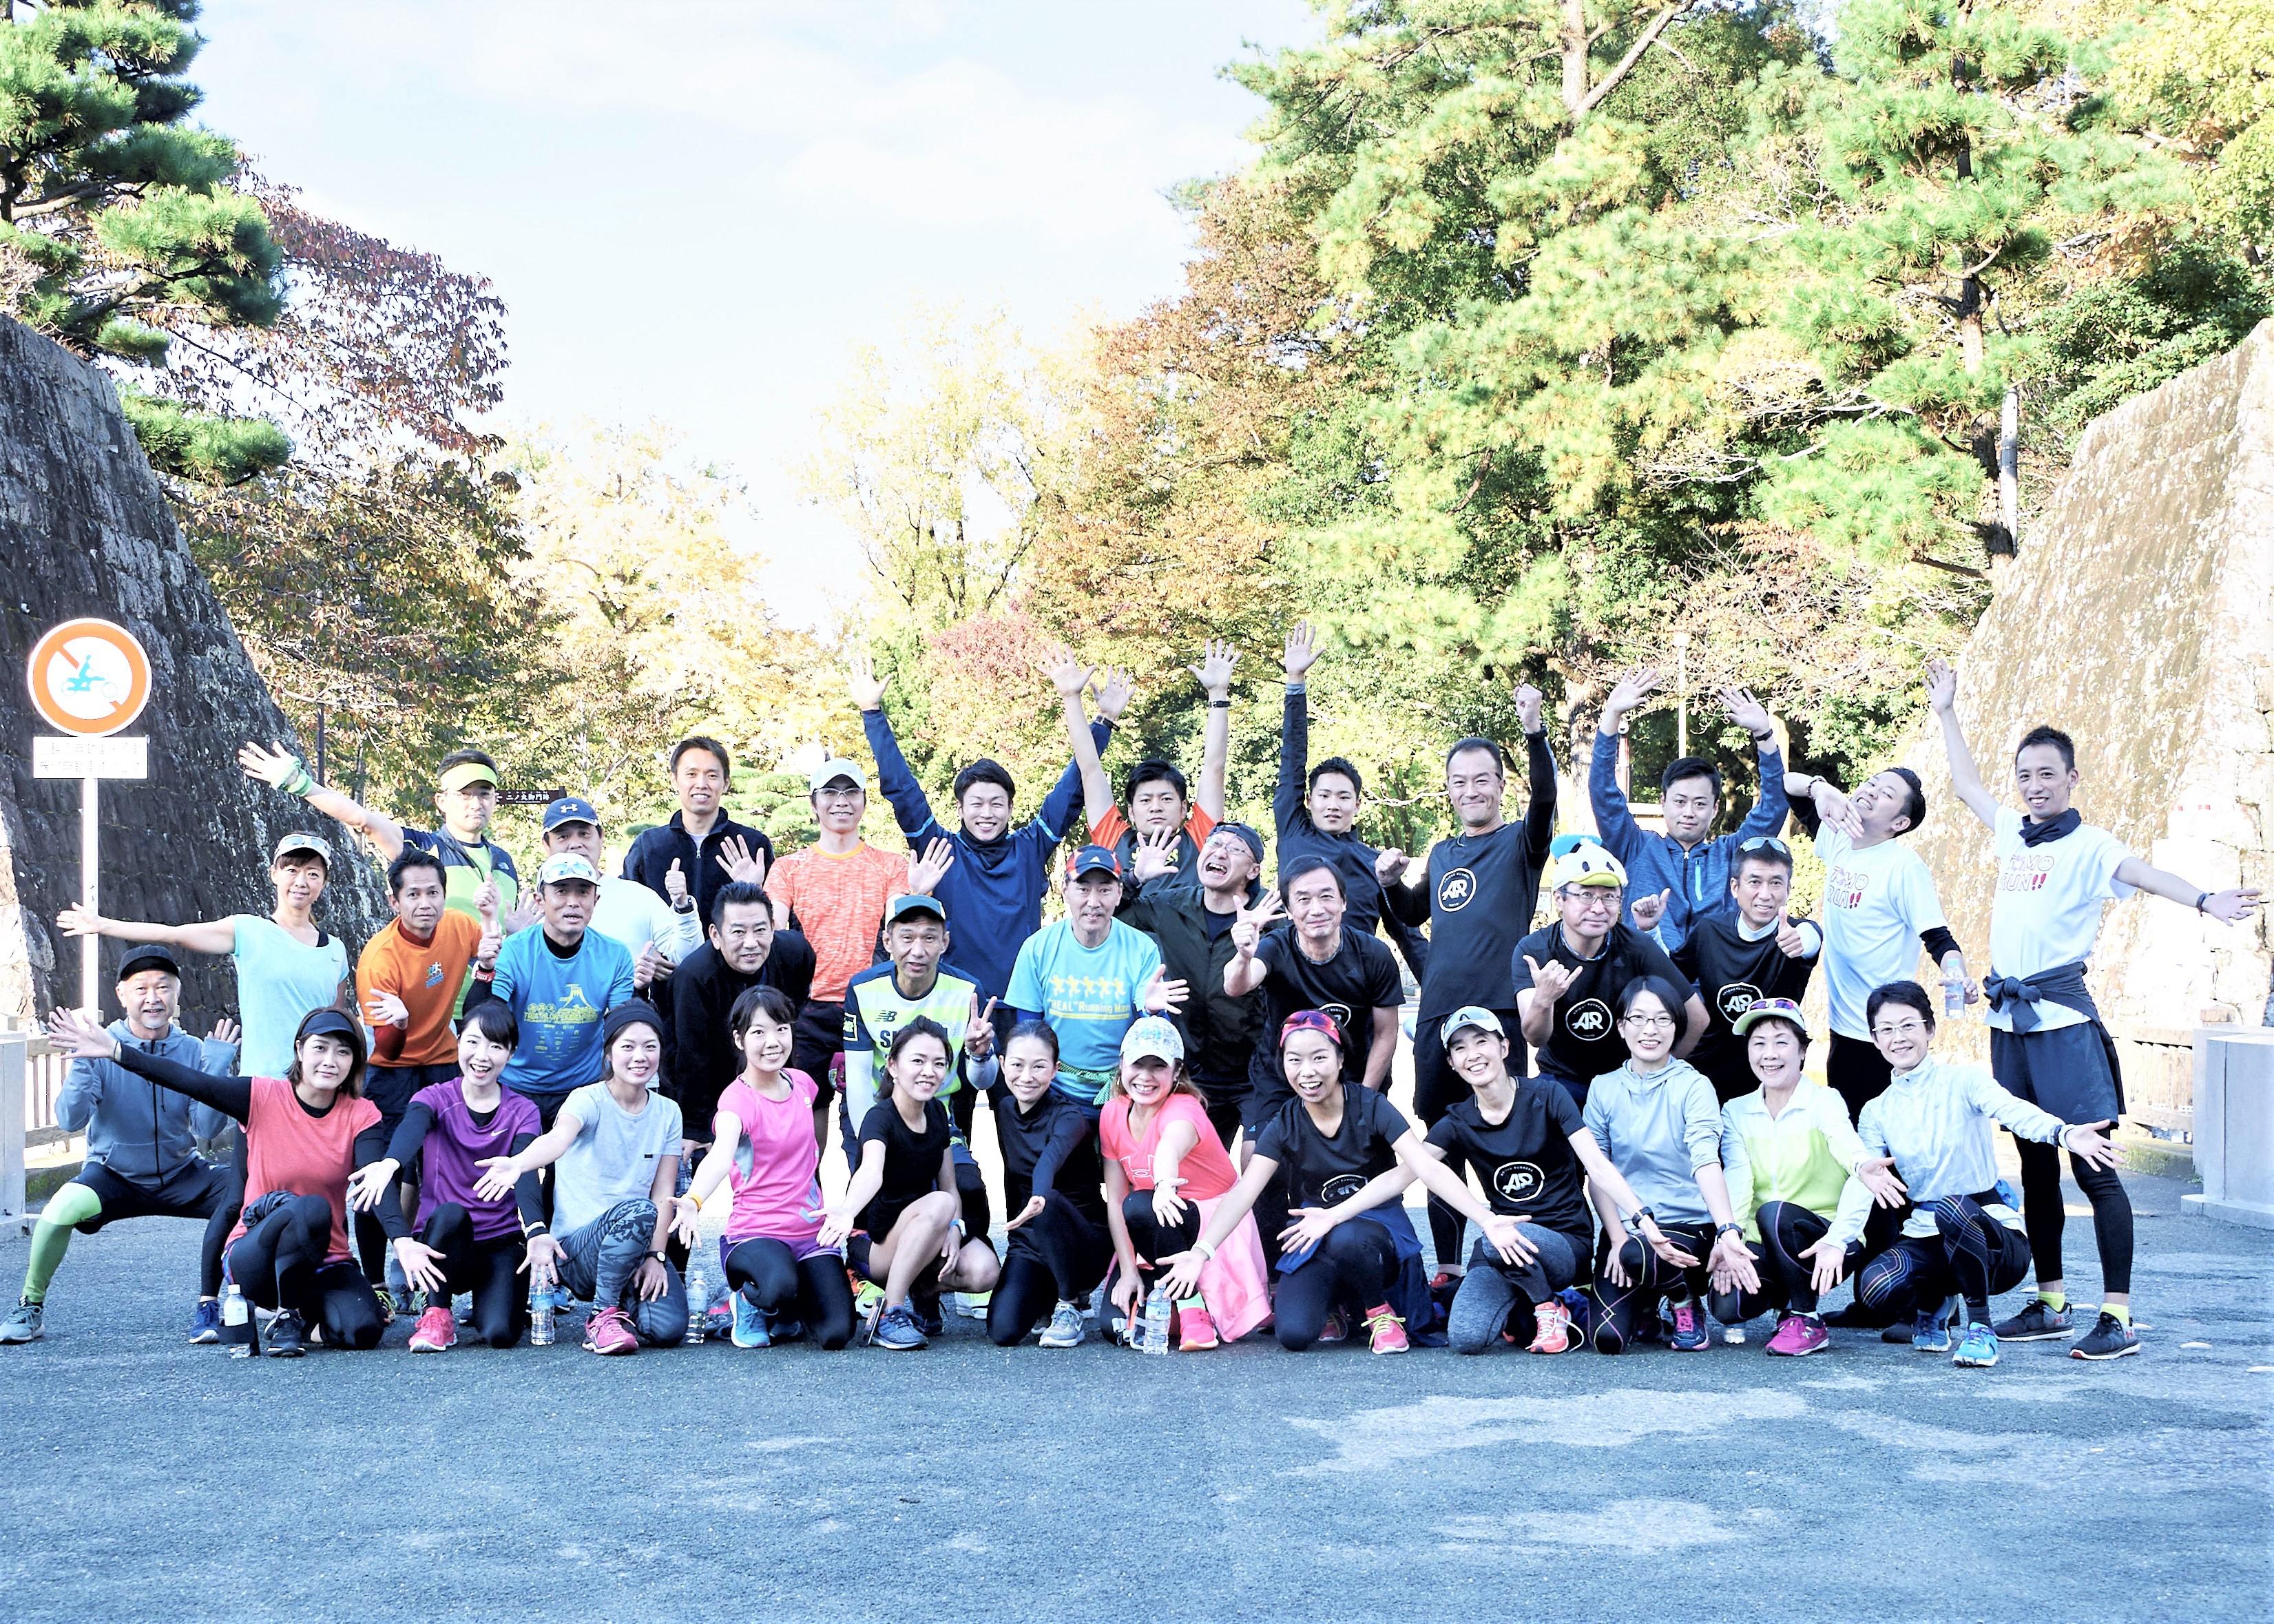 ♡MRG♡神戸マラソン走ってきたよ<br>vol.1 RUN JOURNEY ヤノスポーツ